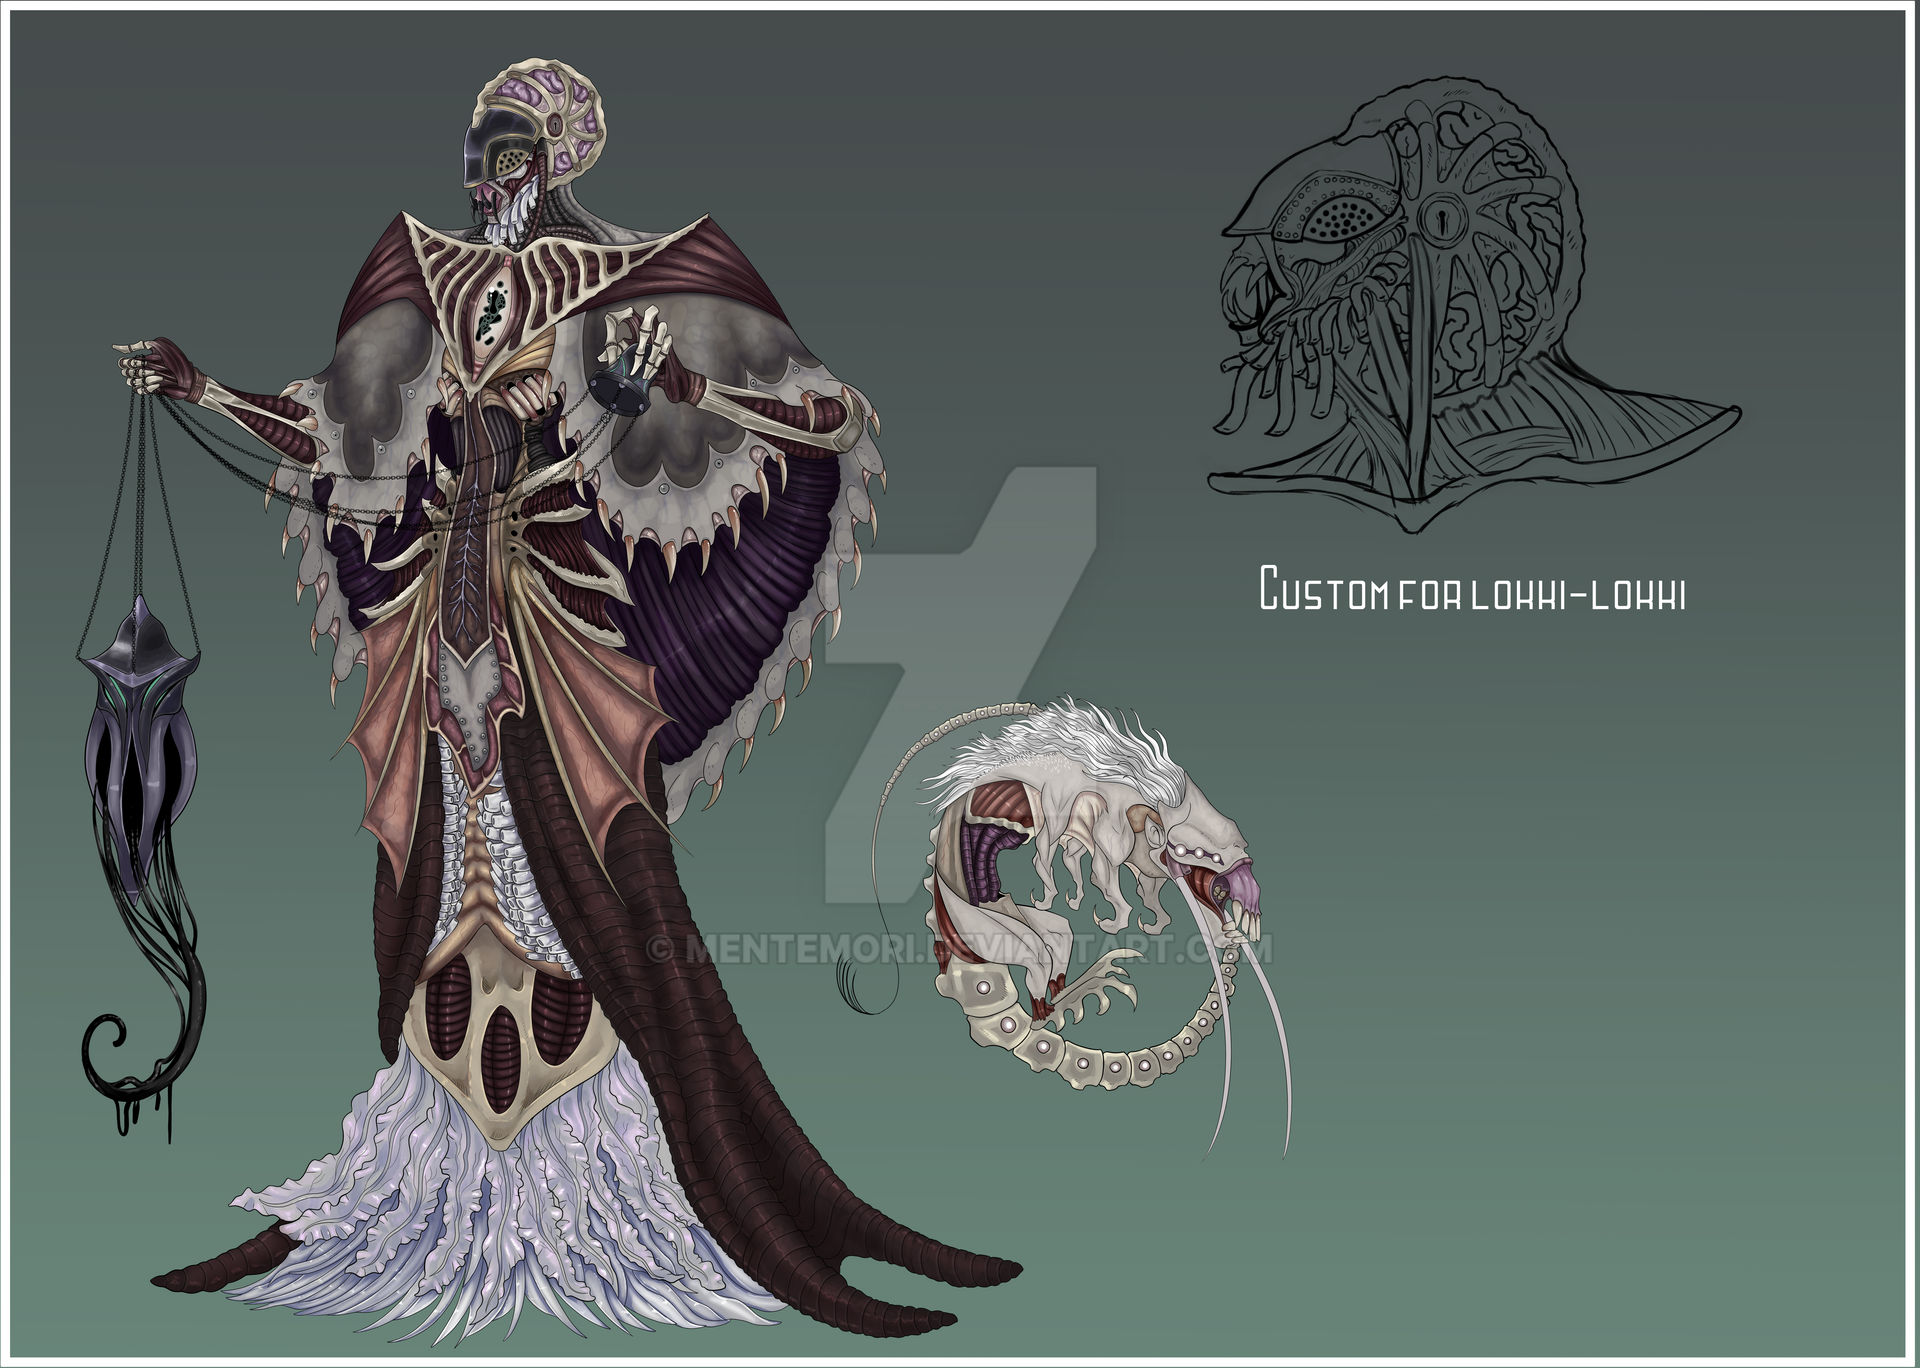 priest_of_a_dying_god____custom_for_lokki_lokki_by_mentemori_ddax0ax-fullview.jpg